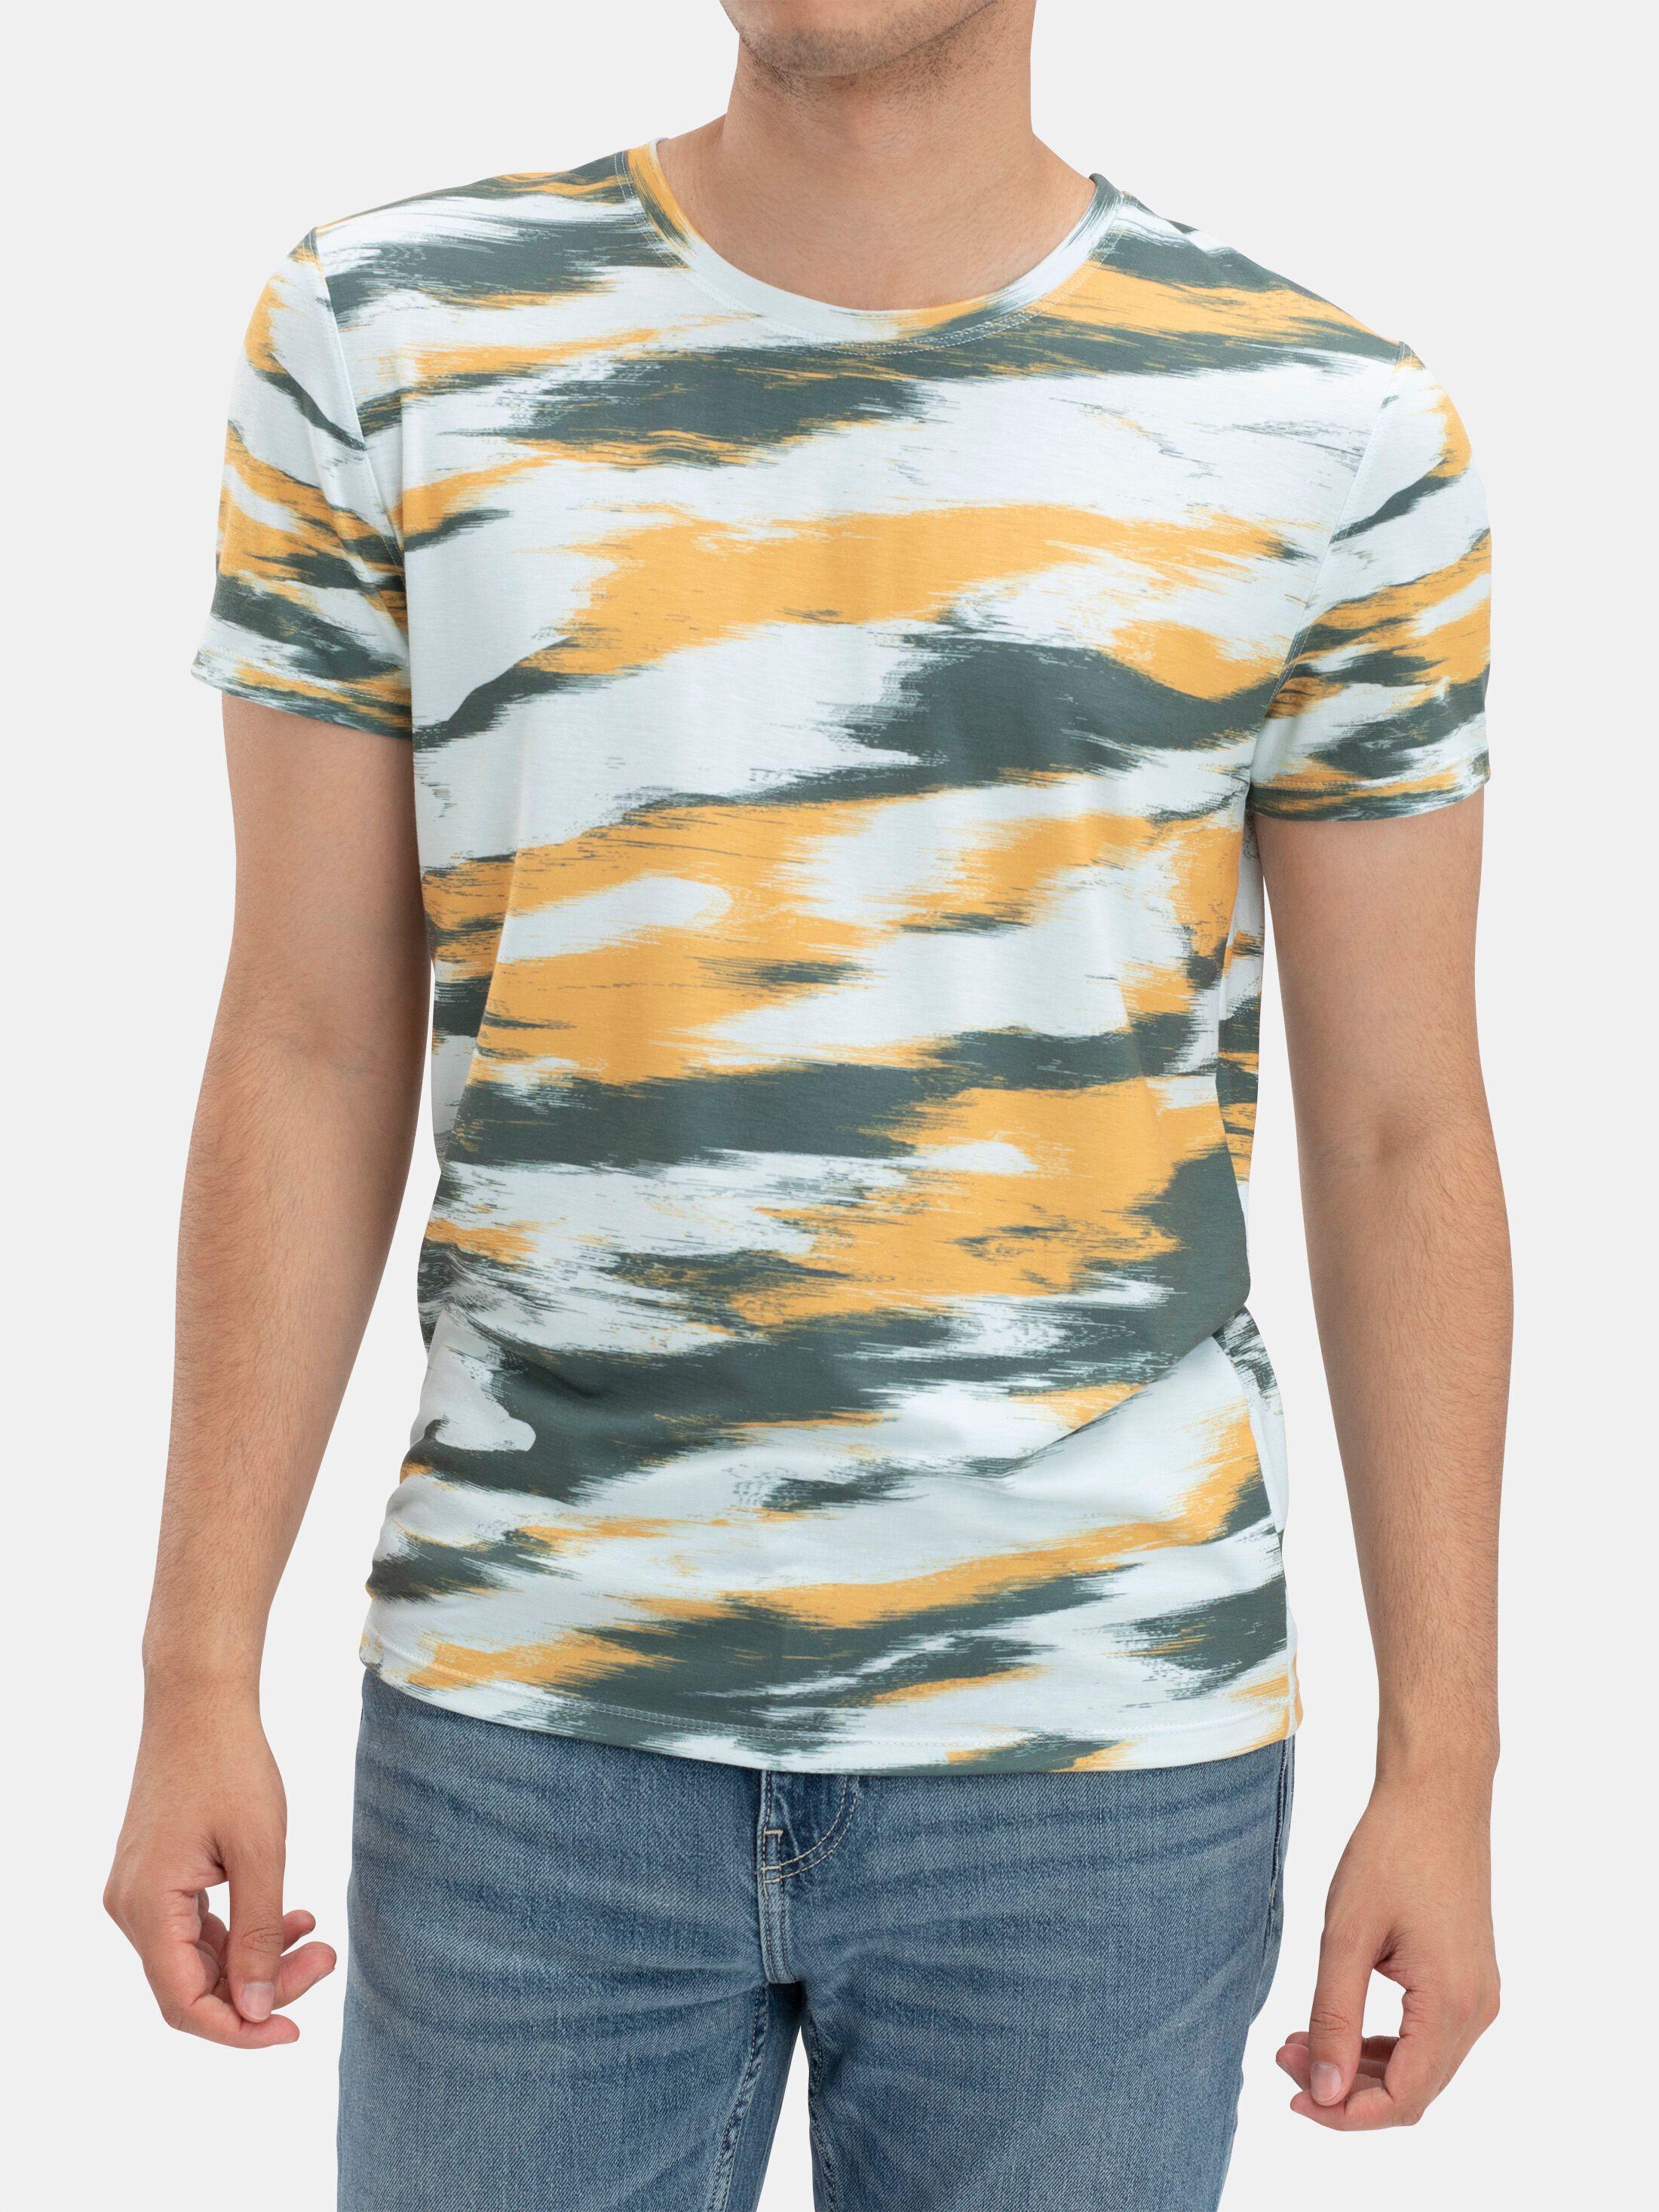 Men's Custom Regular Fit T-Shirt with label